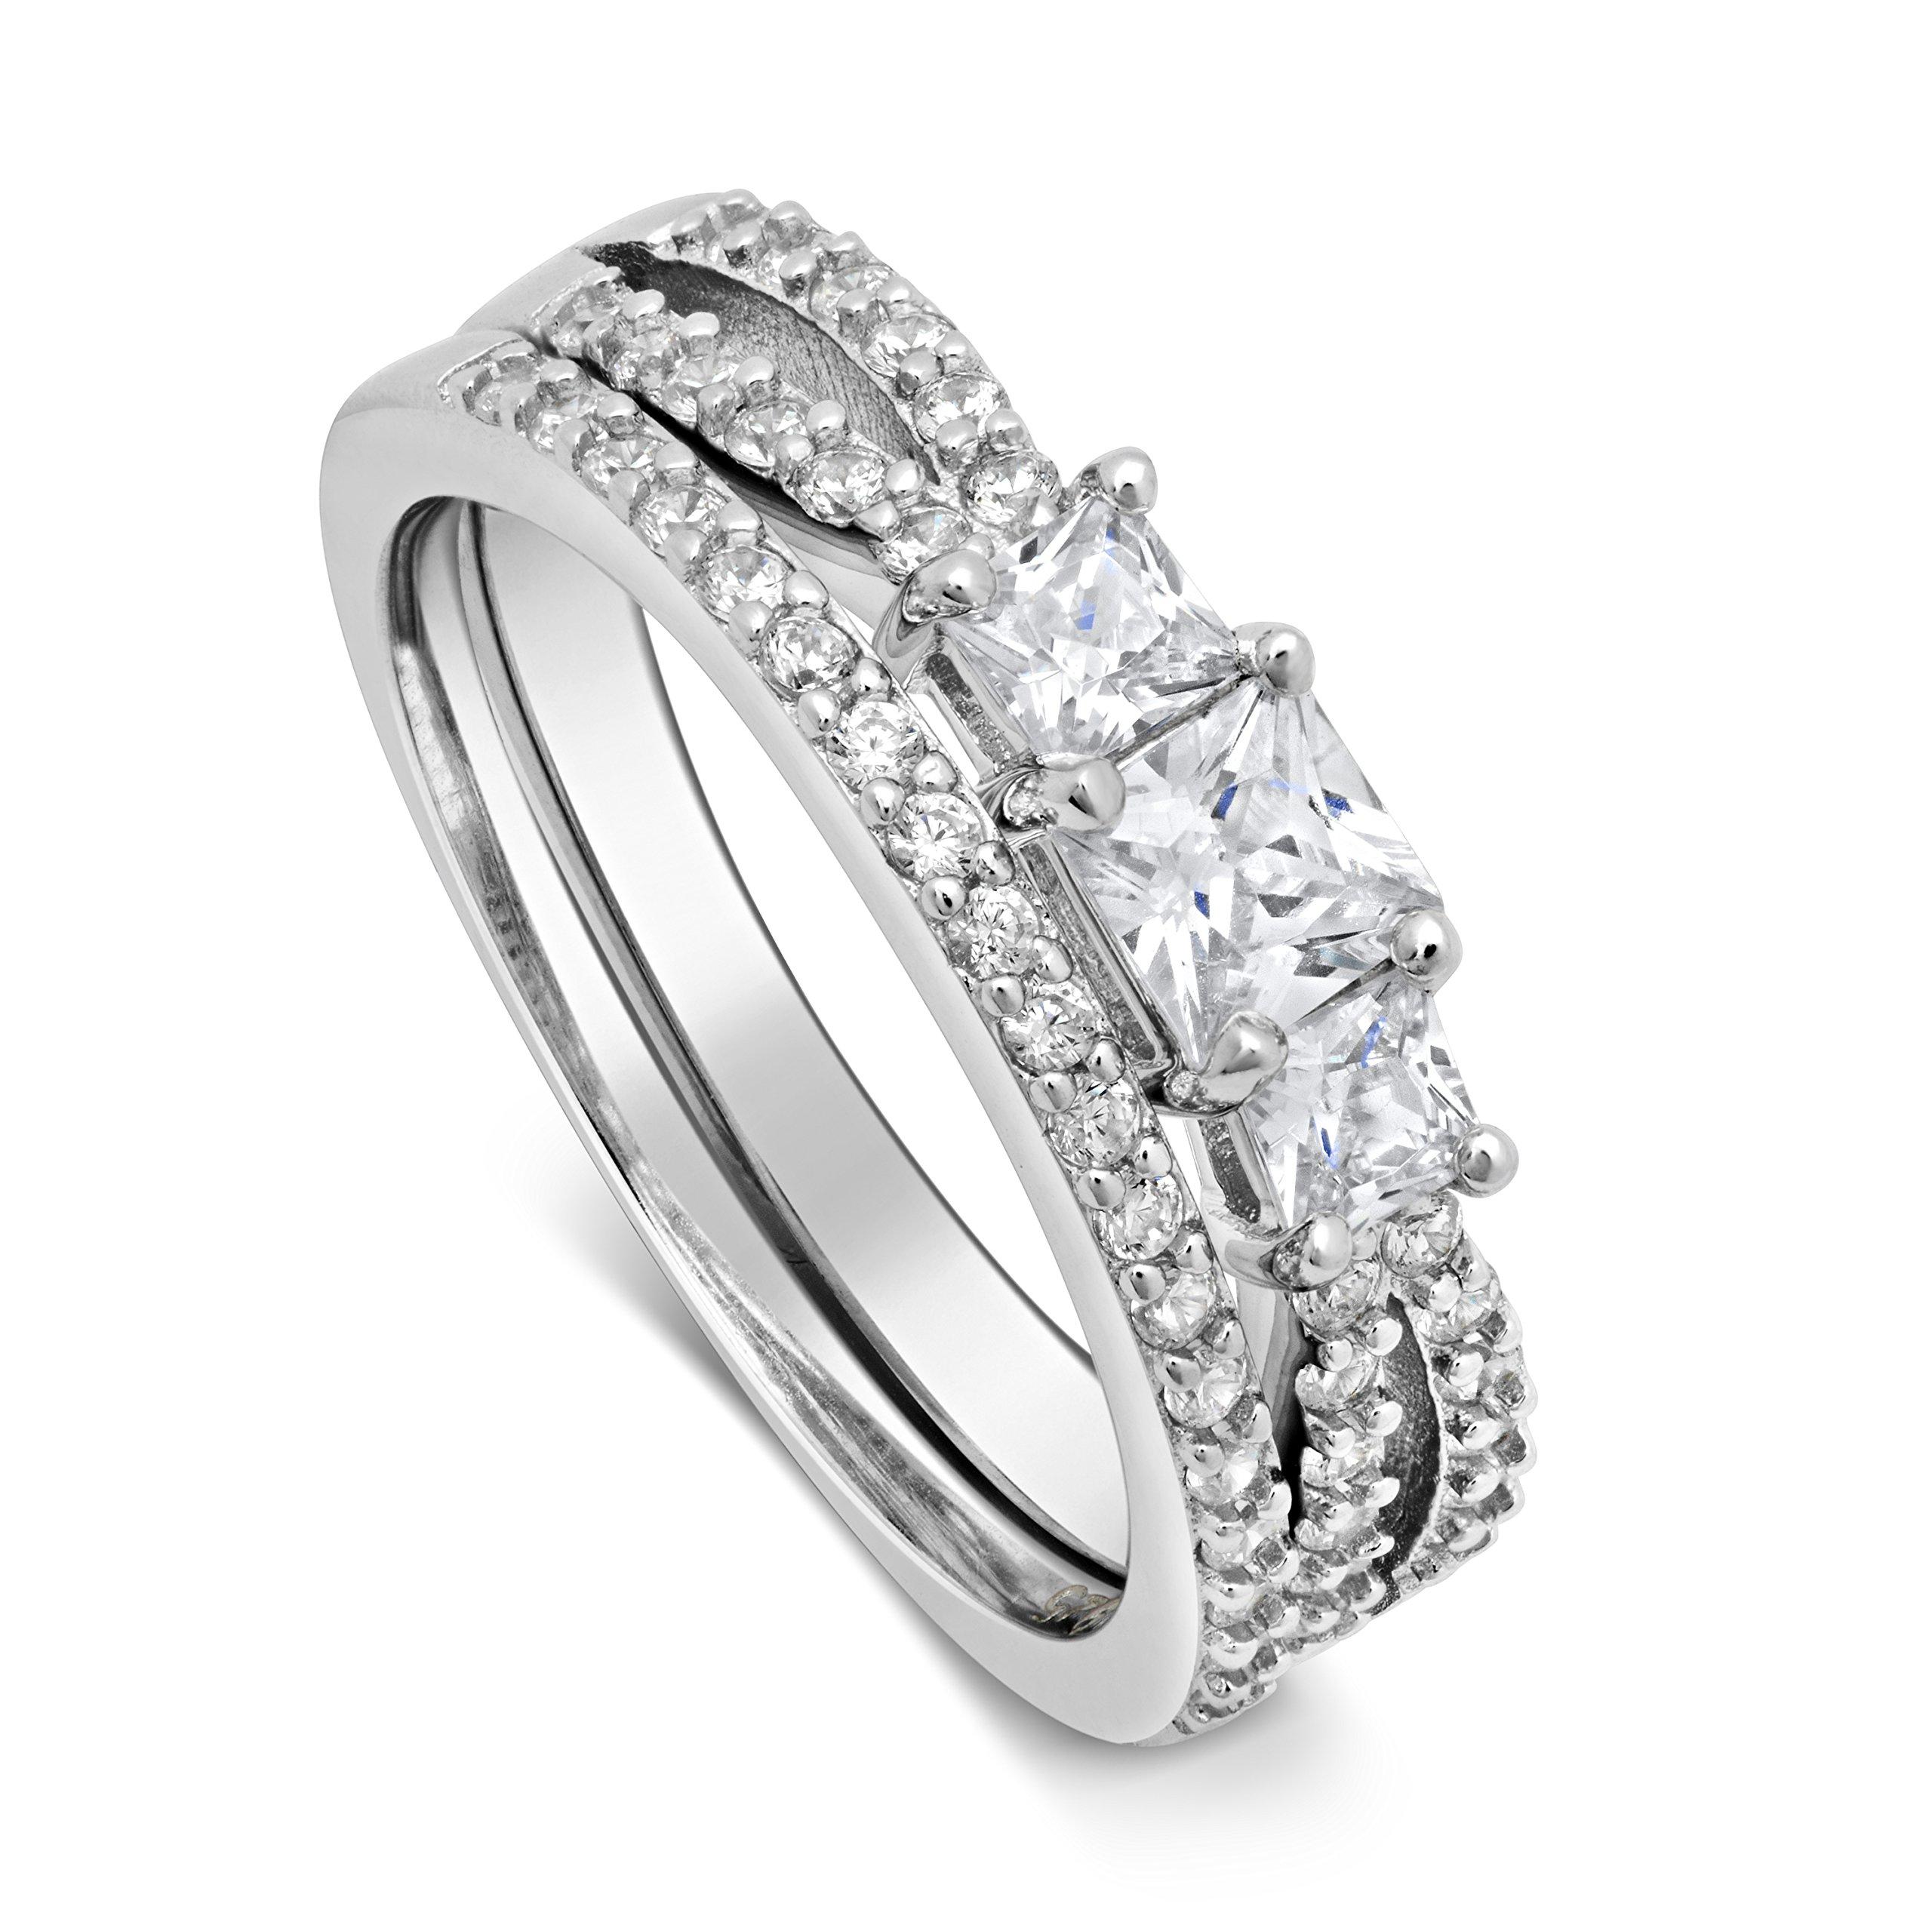 DTLA Sterling Silver ''Past Present Future'' Princess Cut Three Stone CZ Engagement Ring & Wedding Band Set (9)